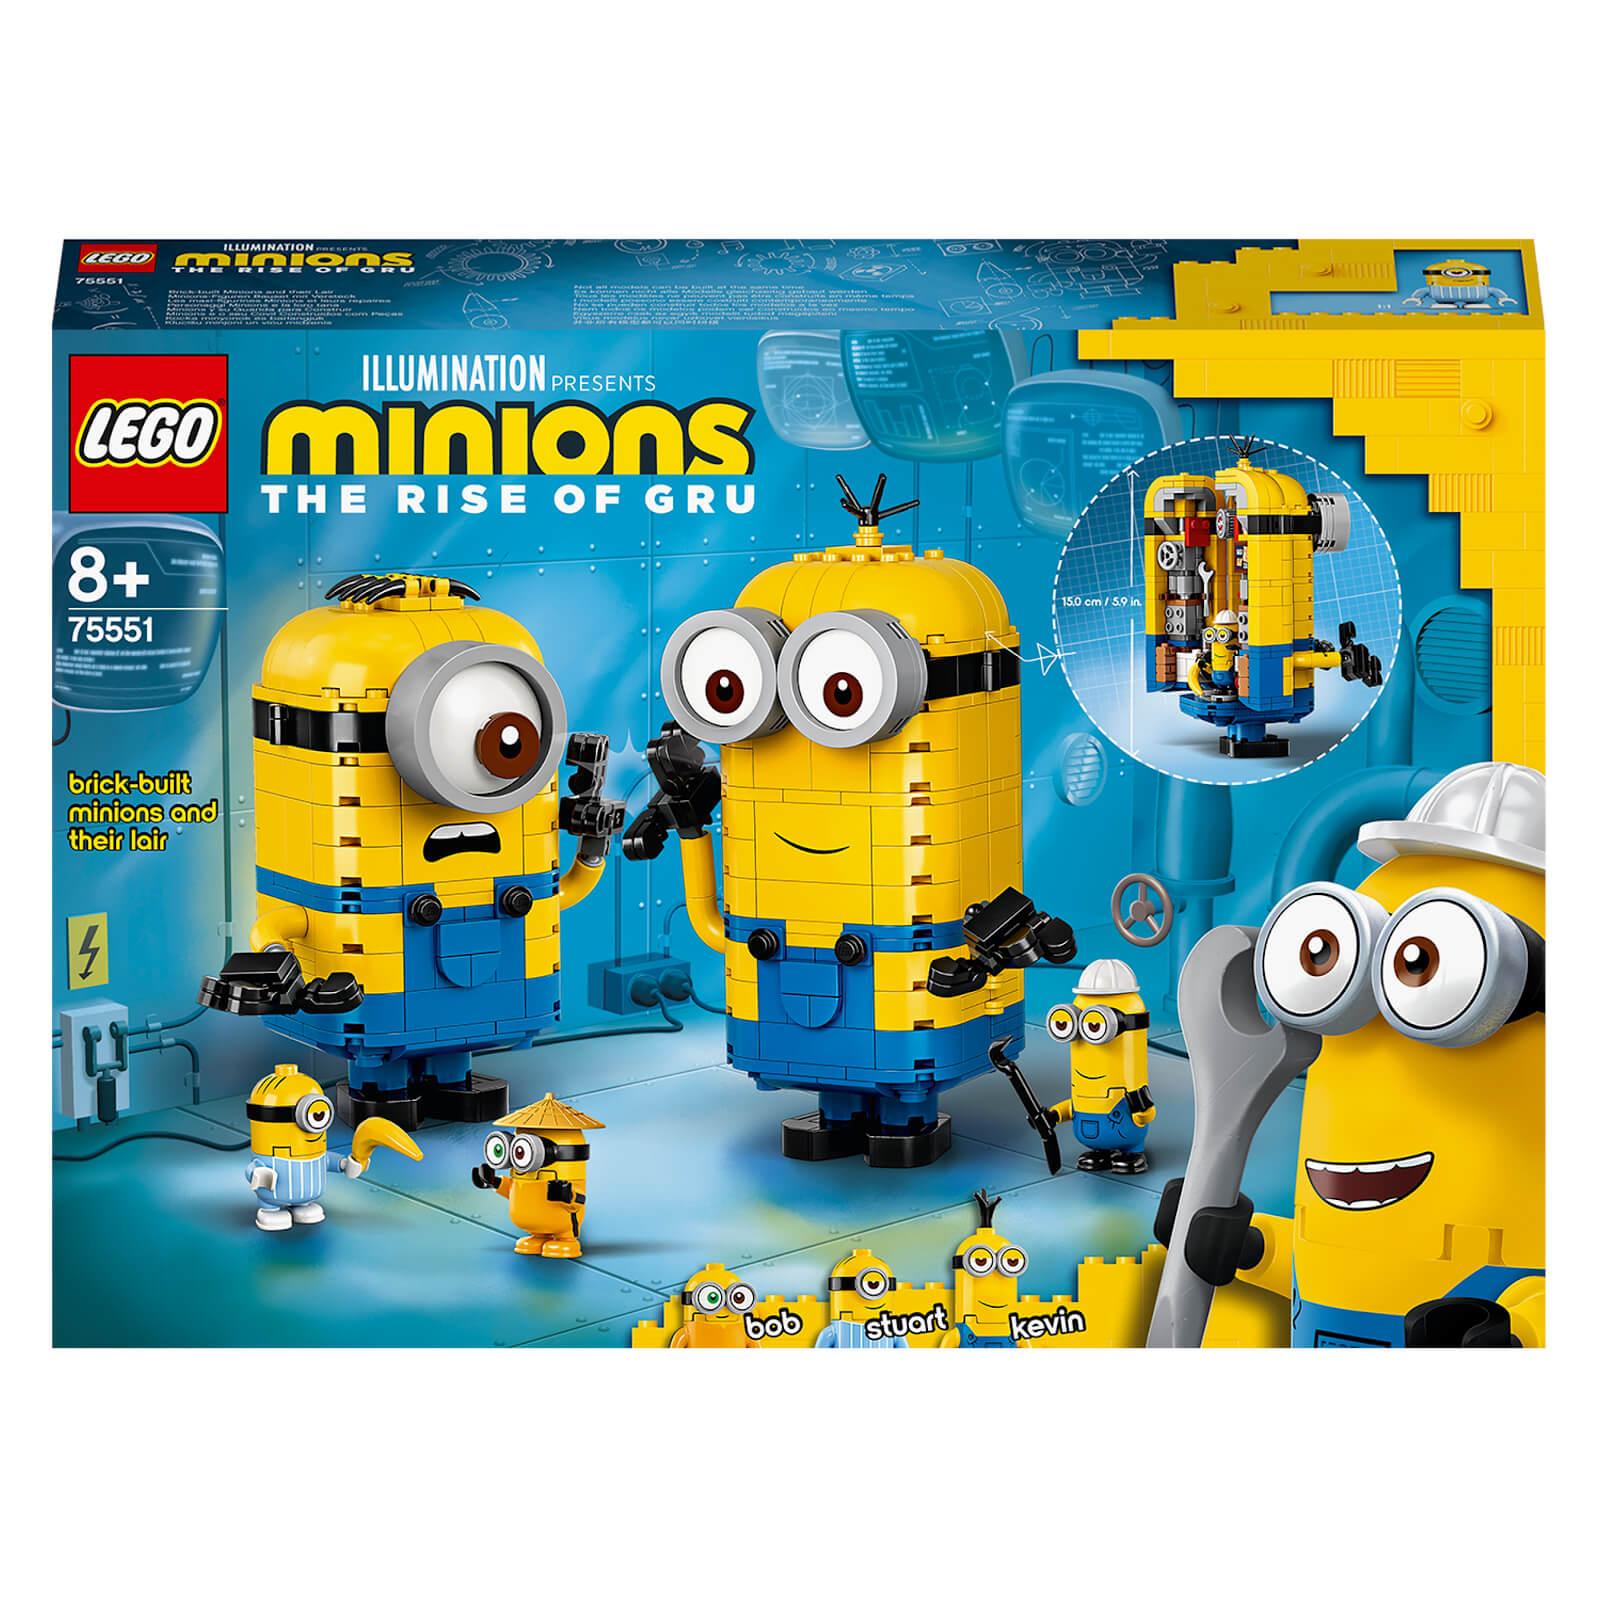 Image of LEGO Minions: Brick-Built Minions: & Their Lair Set (75551)